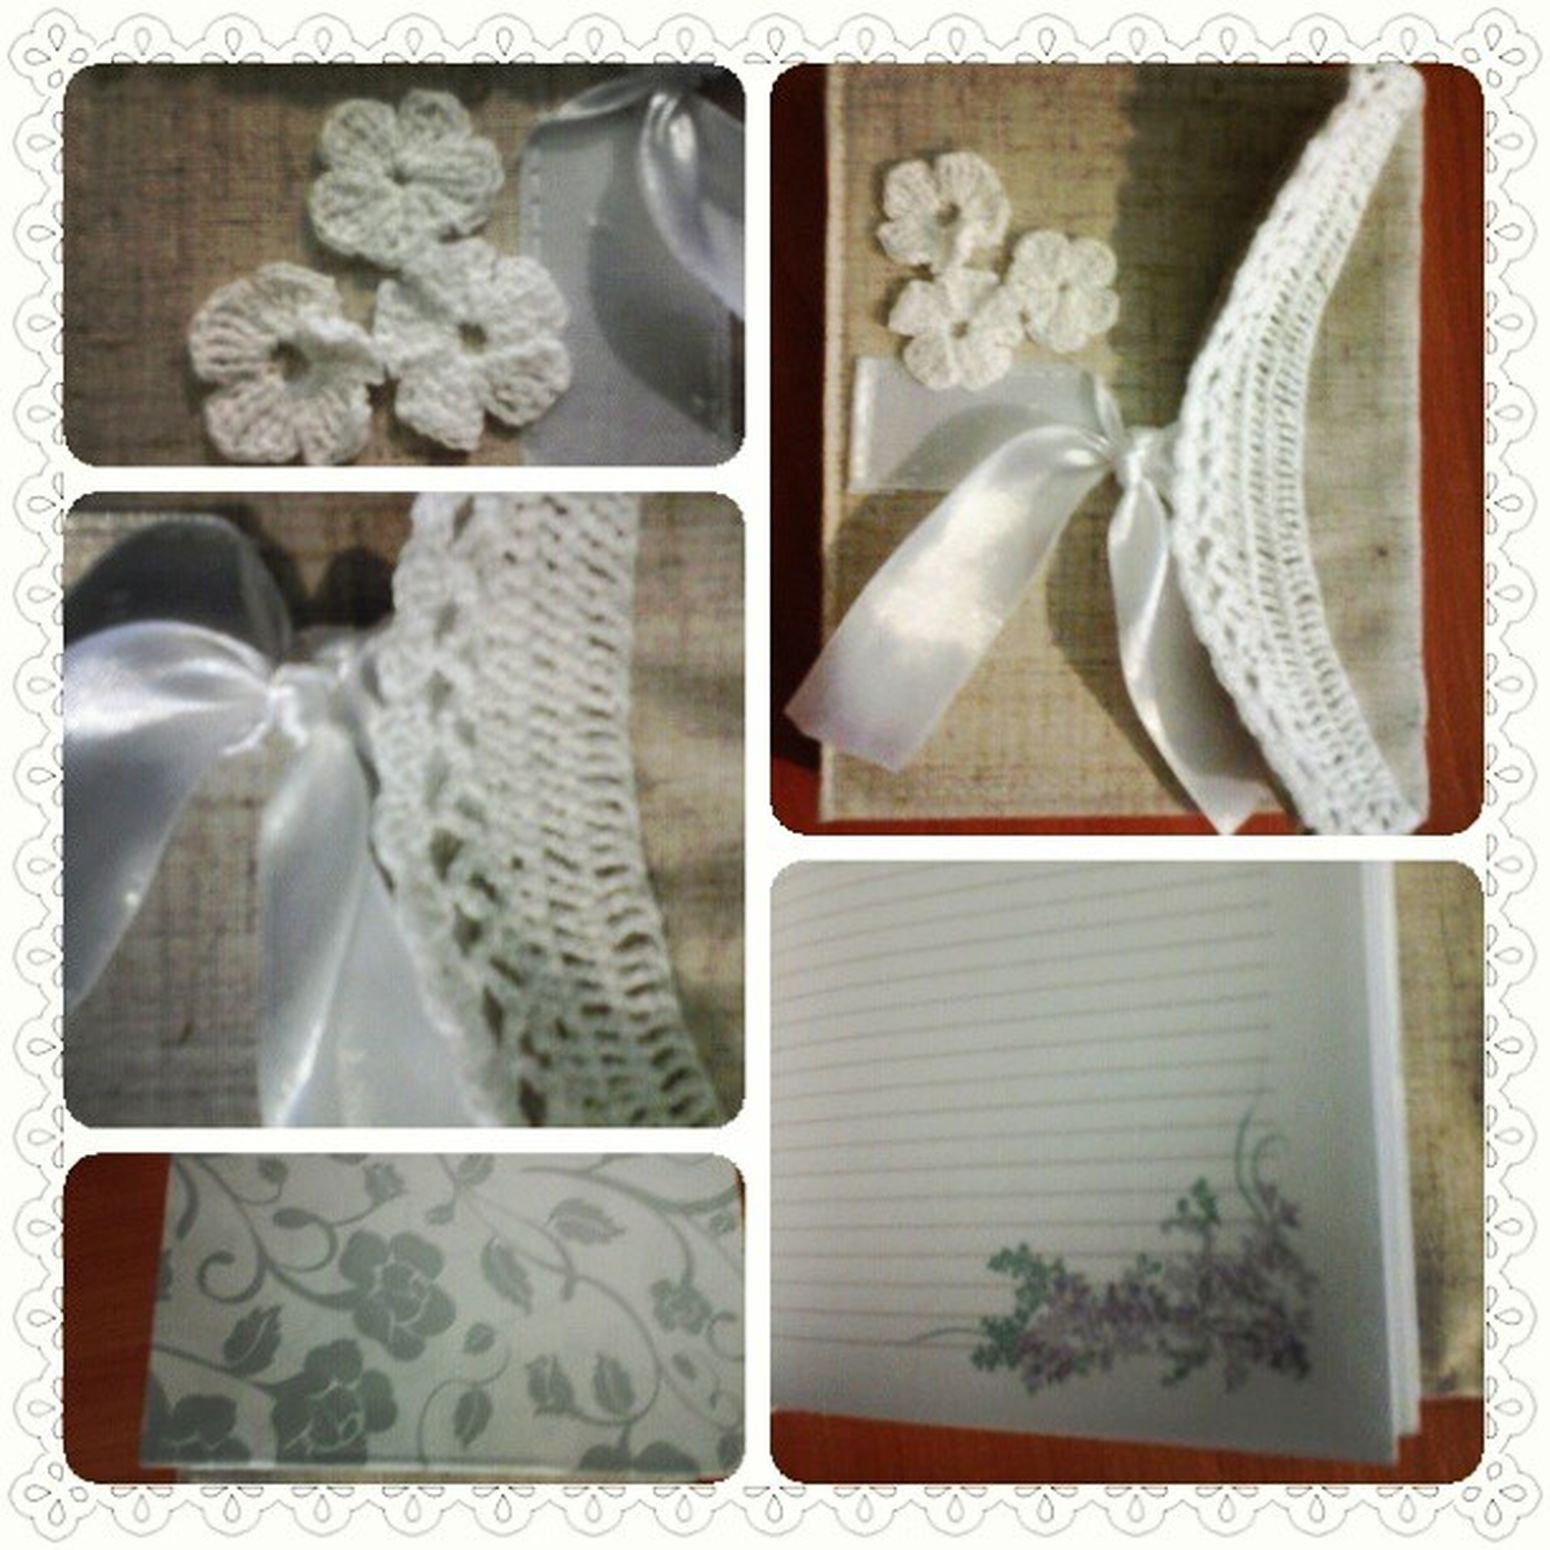 Блокнот с нуля: коптский переплет, плетеный каптал, формат а6; обложка: лен, атласная лента, вязаное крючком кружево и цветы. Handmade Bloknote блокнот кружево ручнаяработа